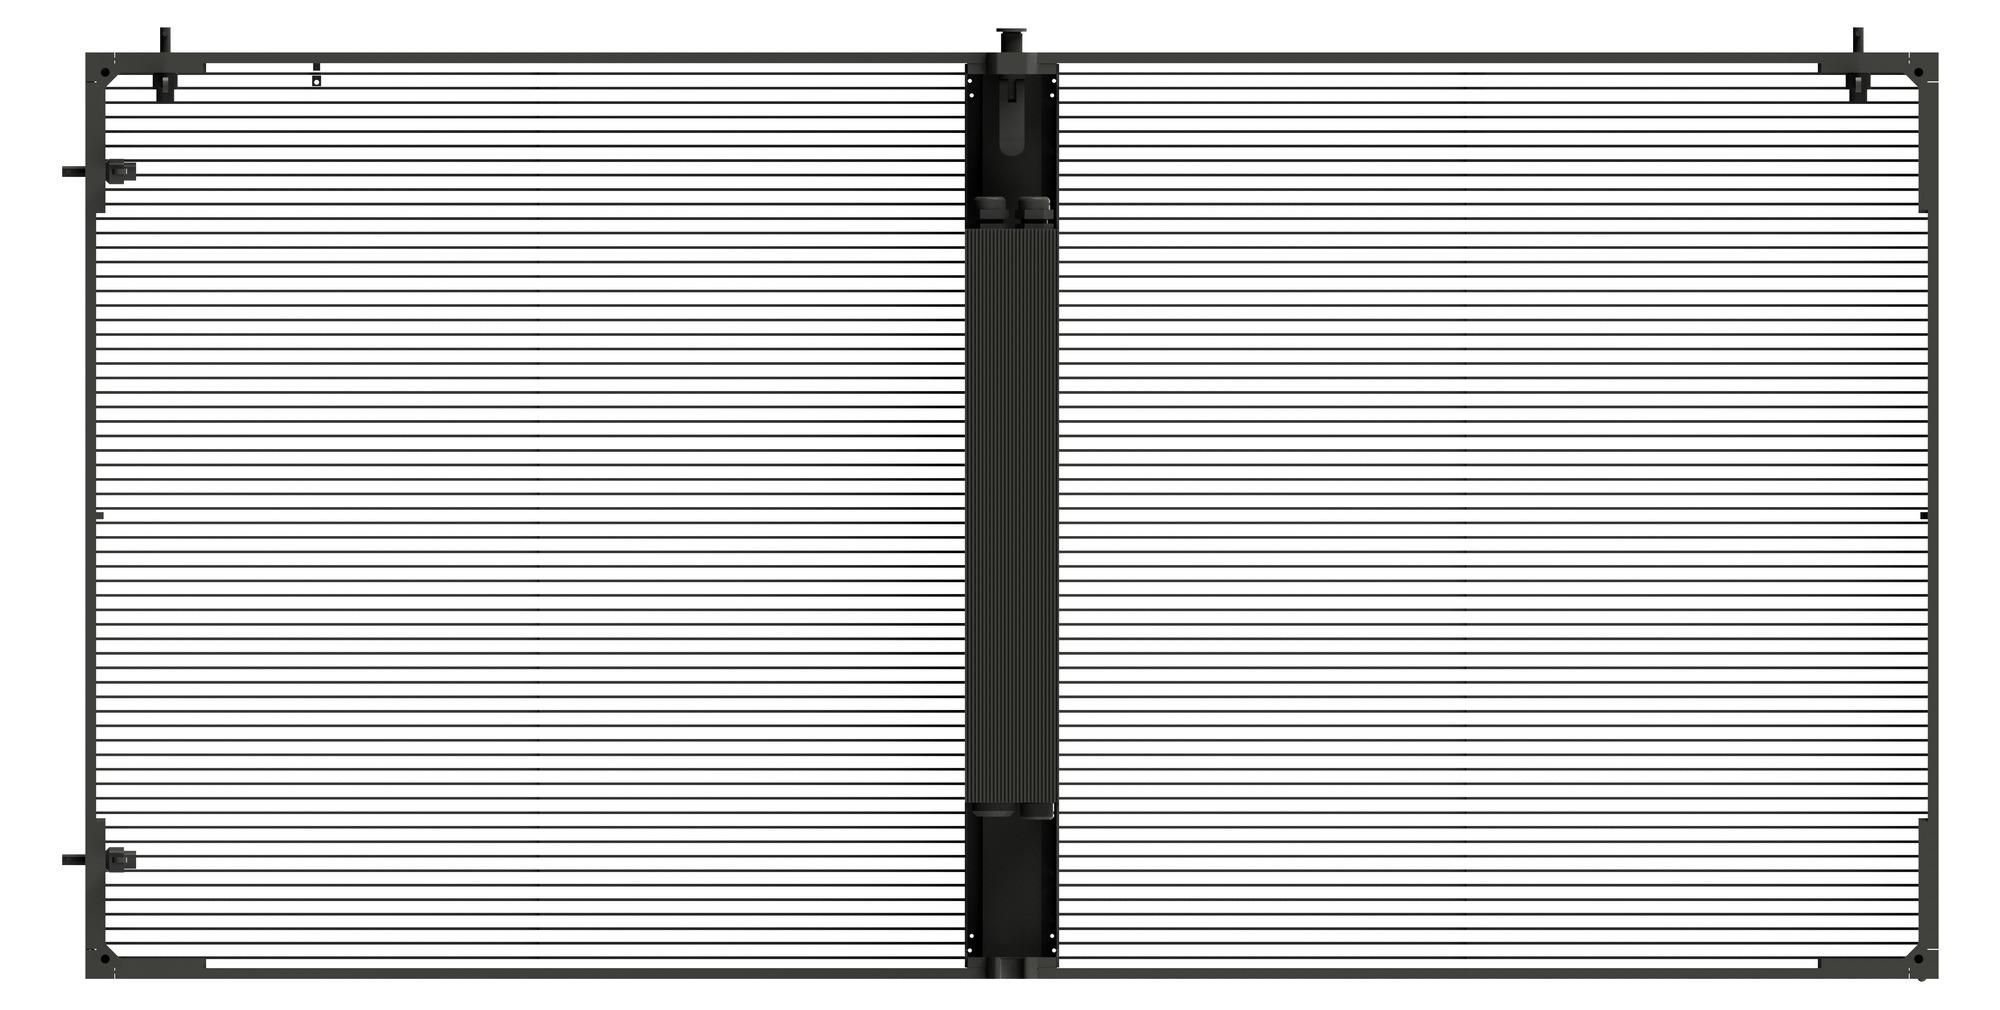 [Hot Item] LED Curtain, LED Video Curtain/Rental Video Wall/LED Mesh  Curtain/Mesh Panel